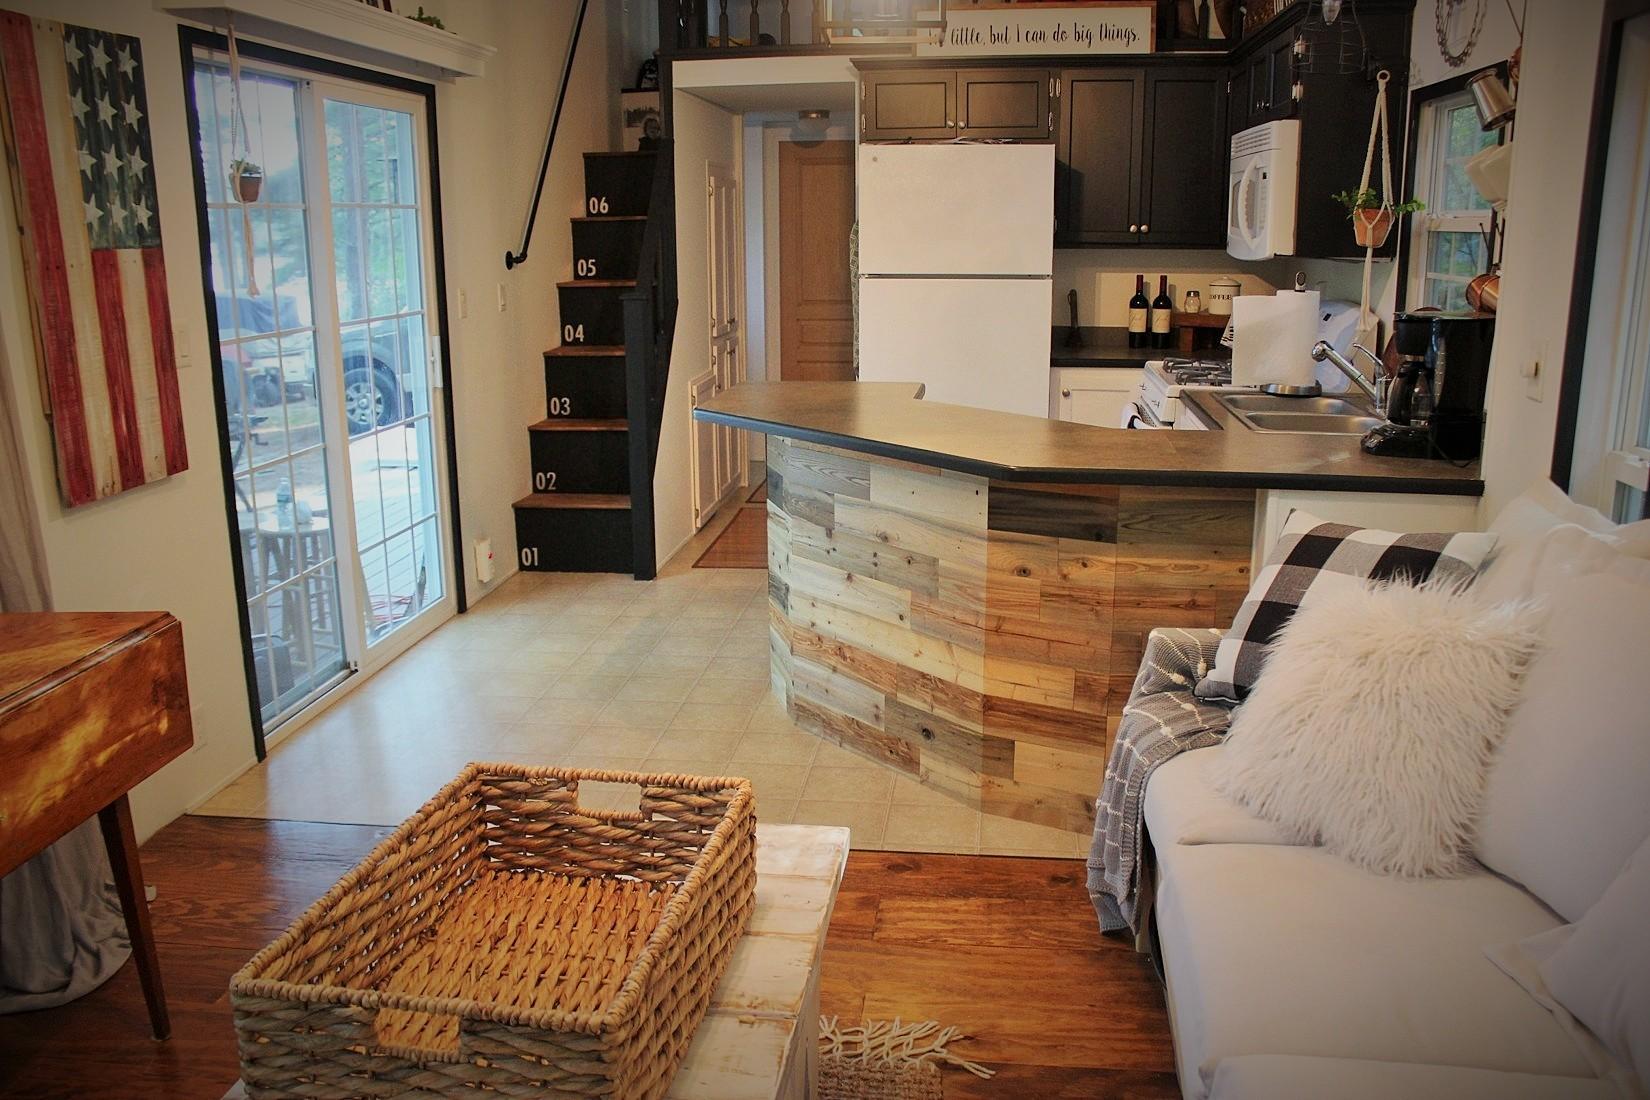 Fullsize Of Tiny House Kitchen